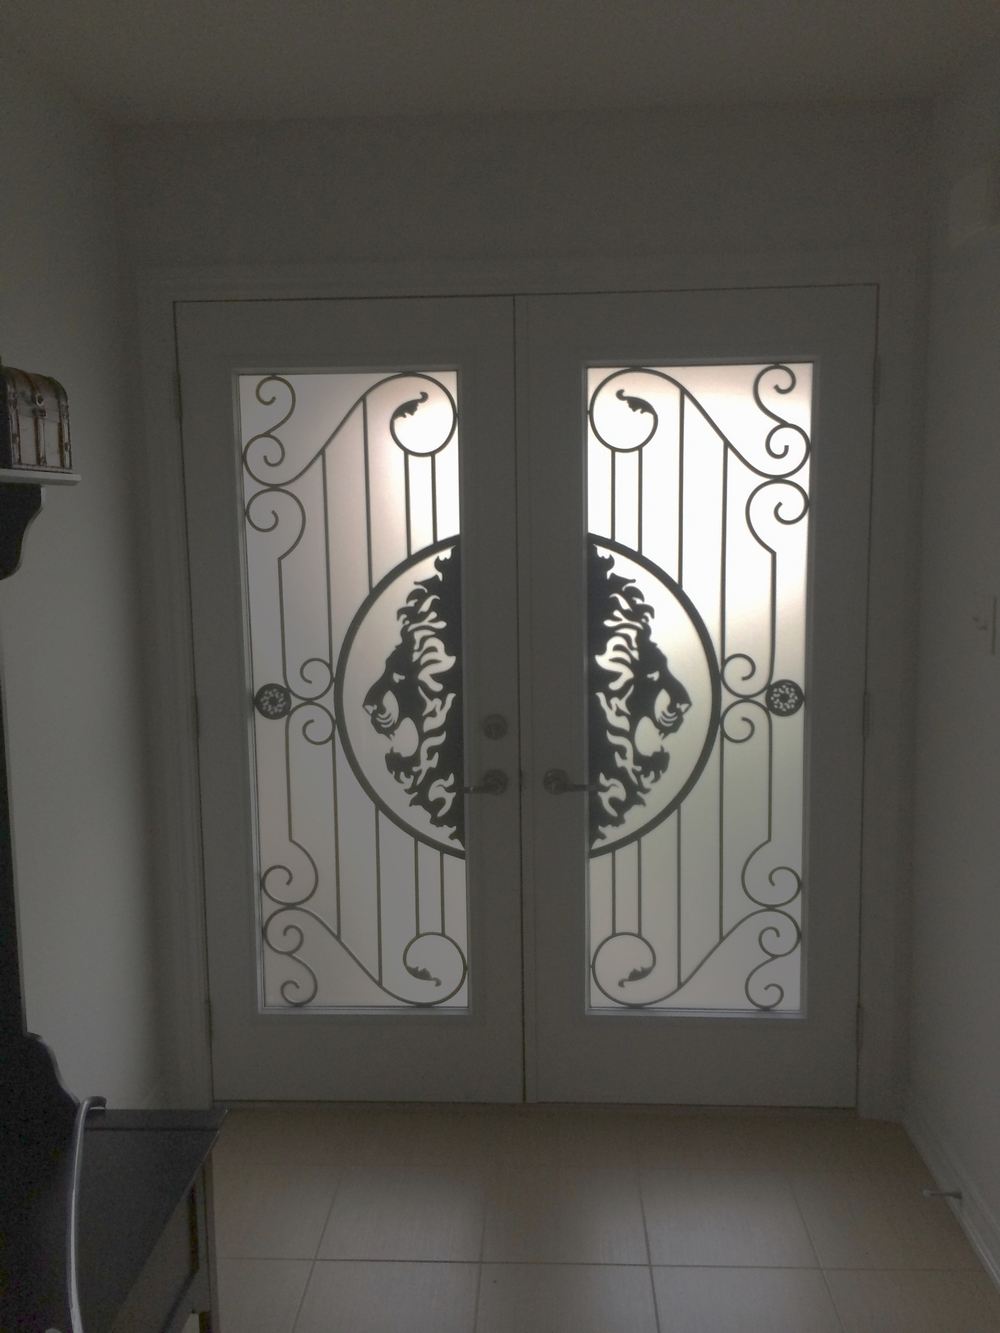 Thunderbay-wrought-iron-glass-door-inserts